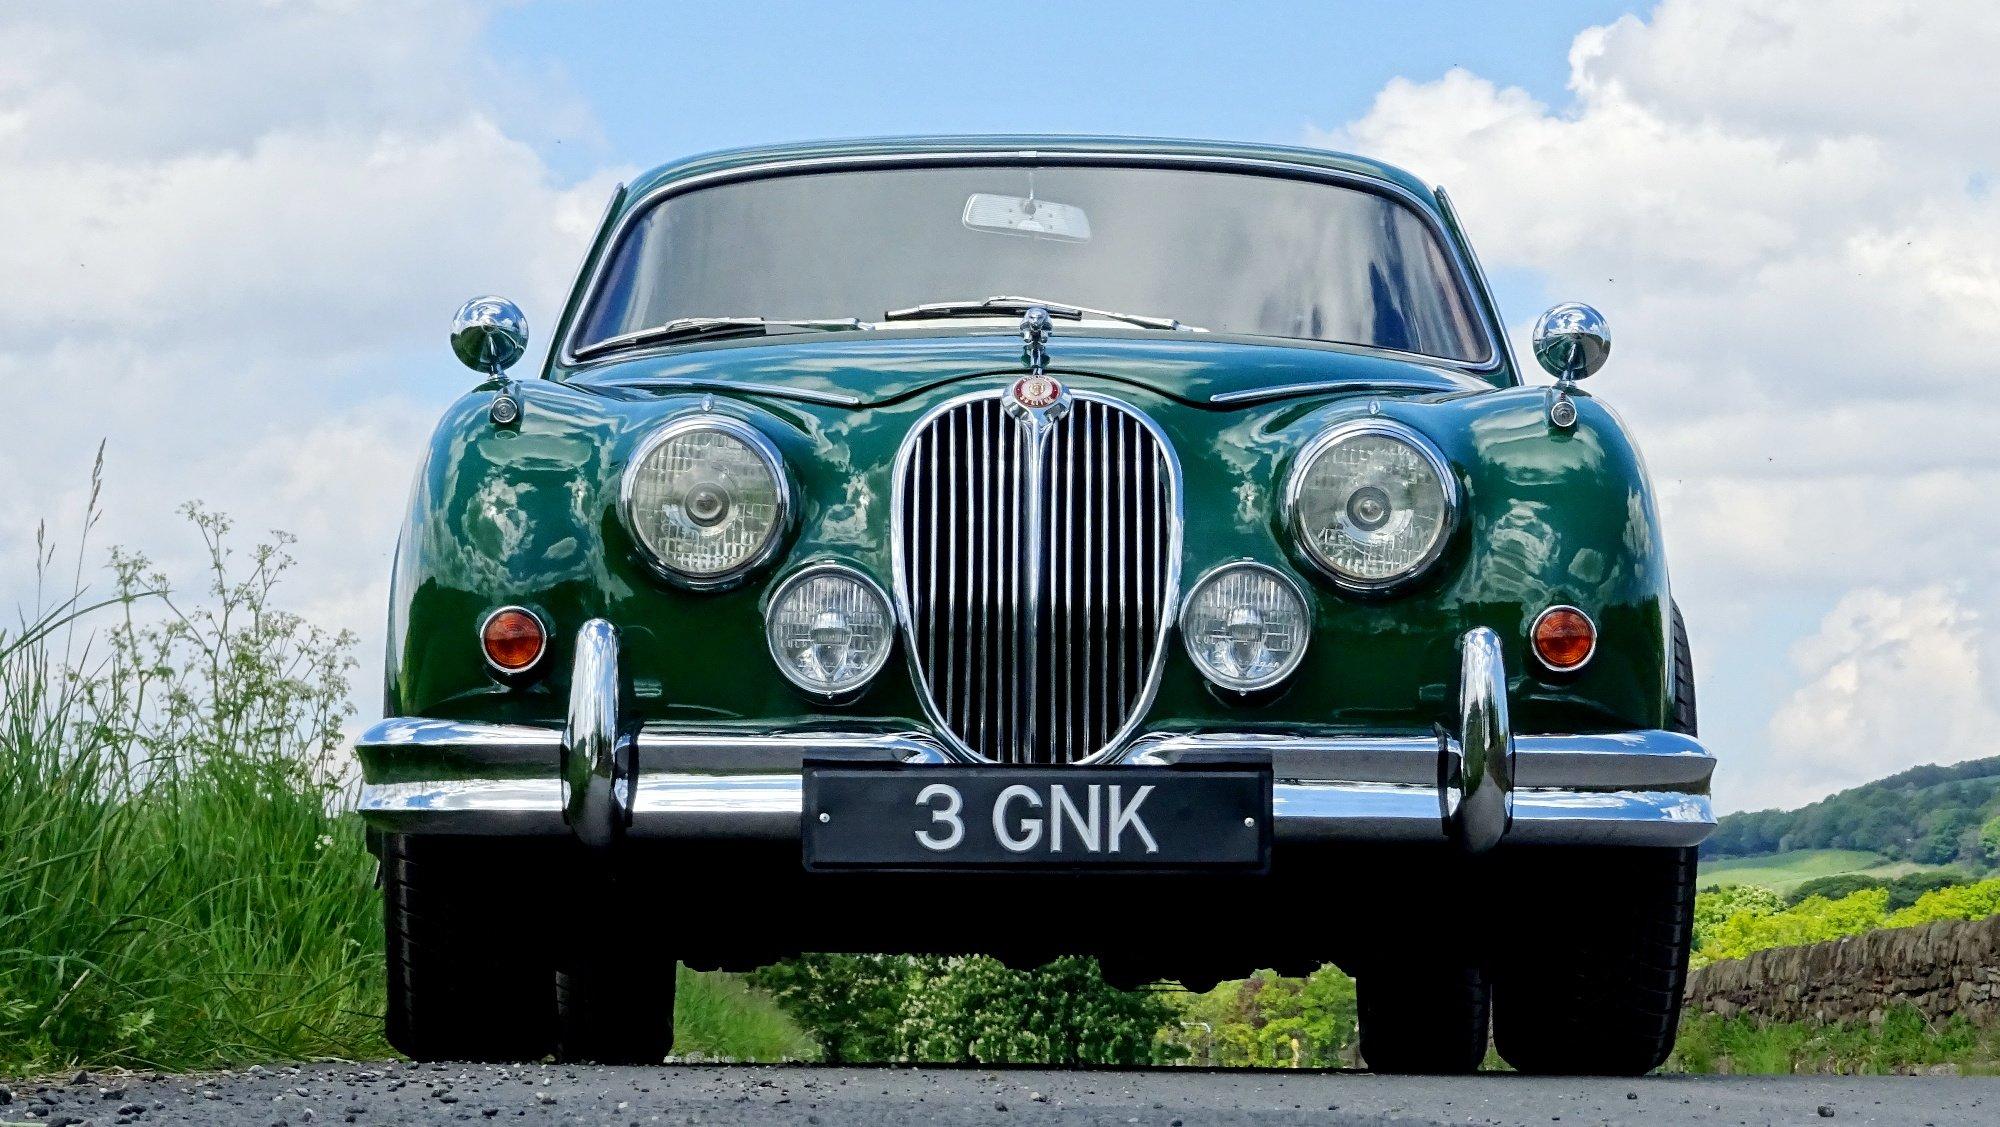 1961 JAGUAR MK2 3.8 LITRE BEAUTIFUL BRITISH CLASSIC CAR For Sale (picture 2 of 6)